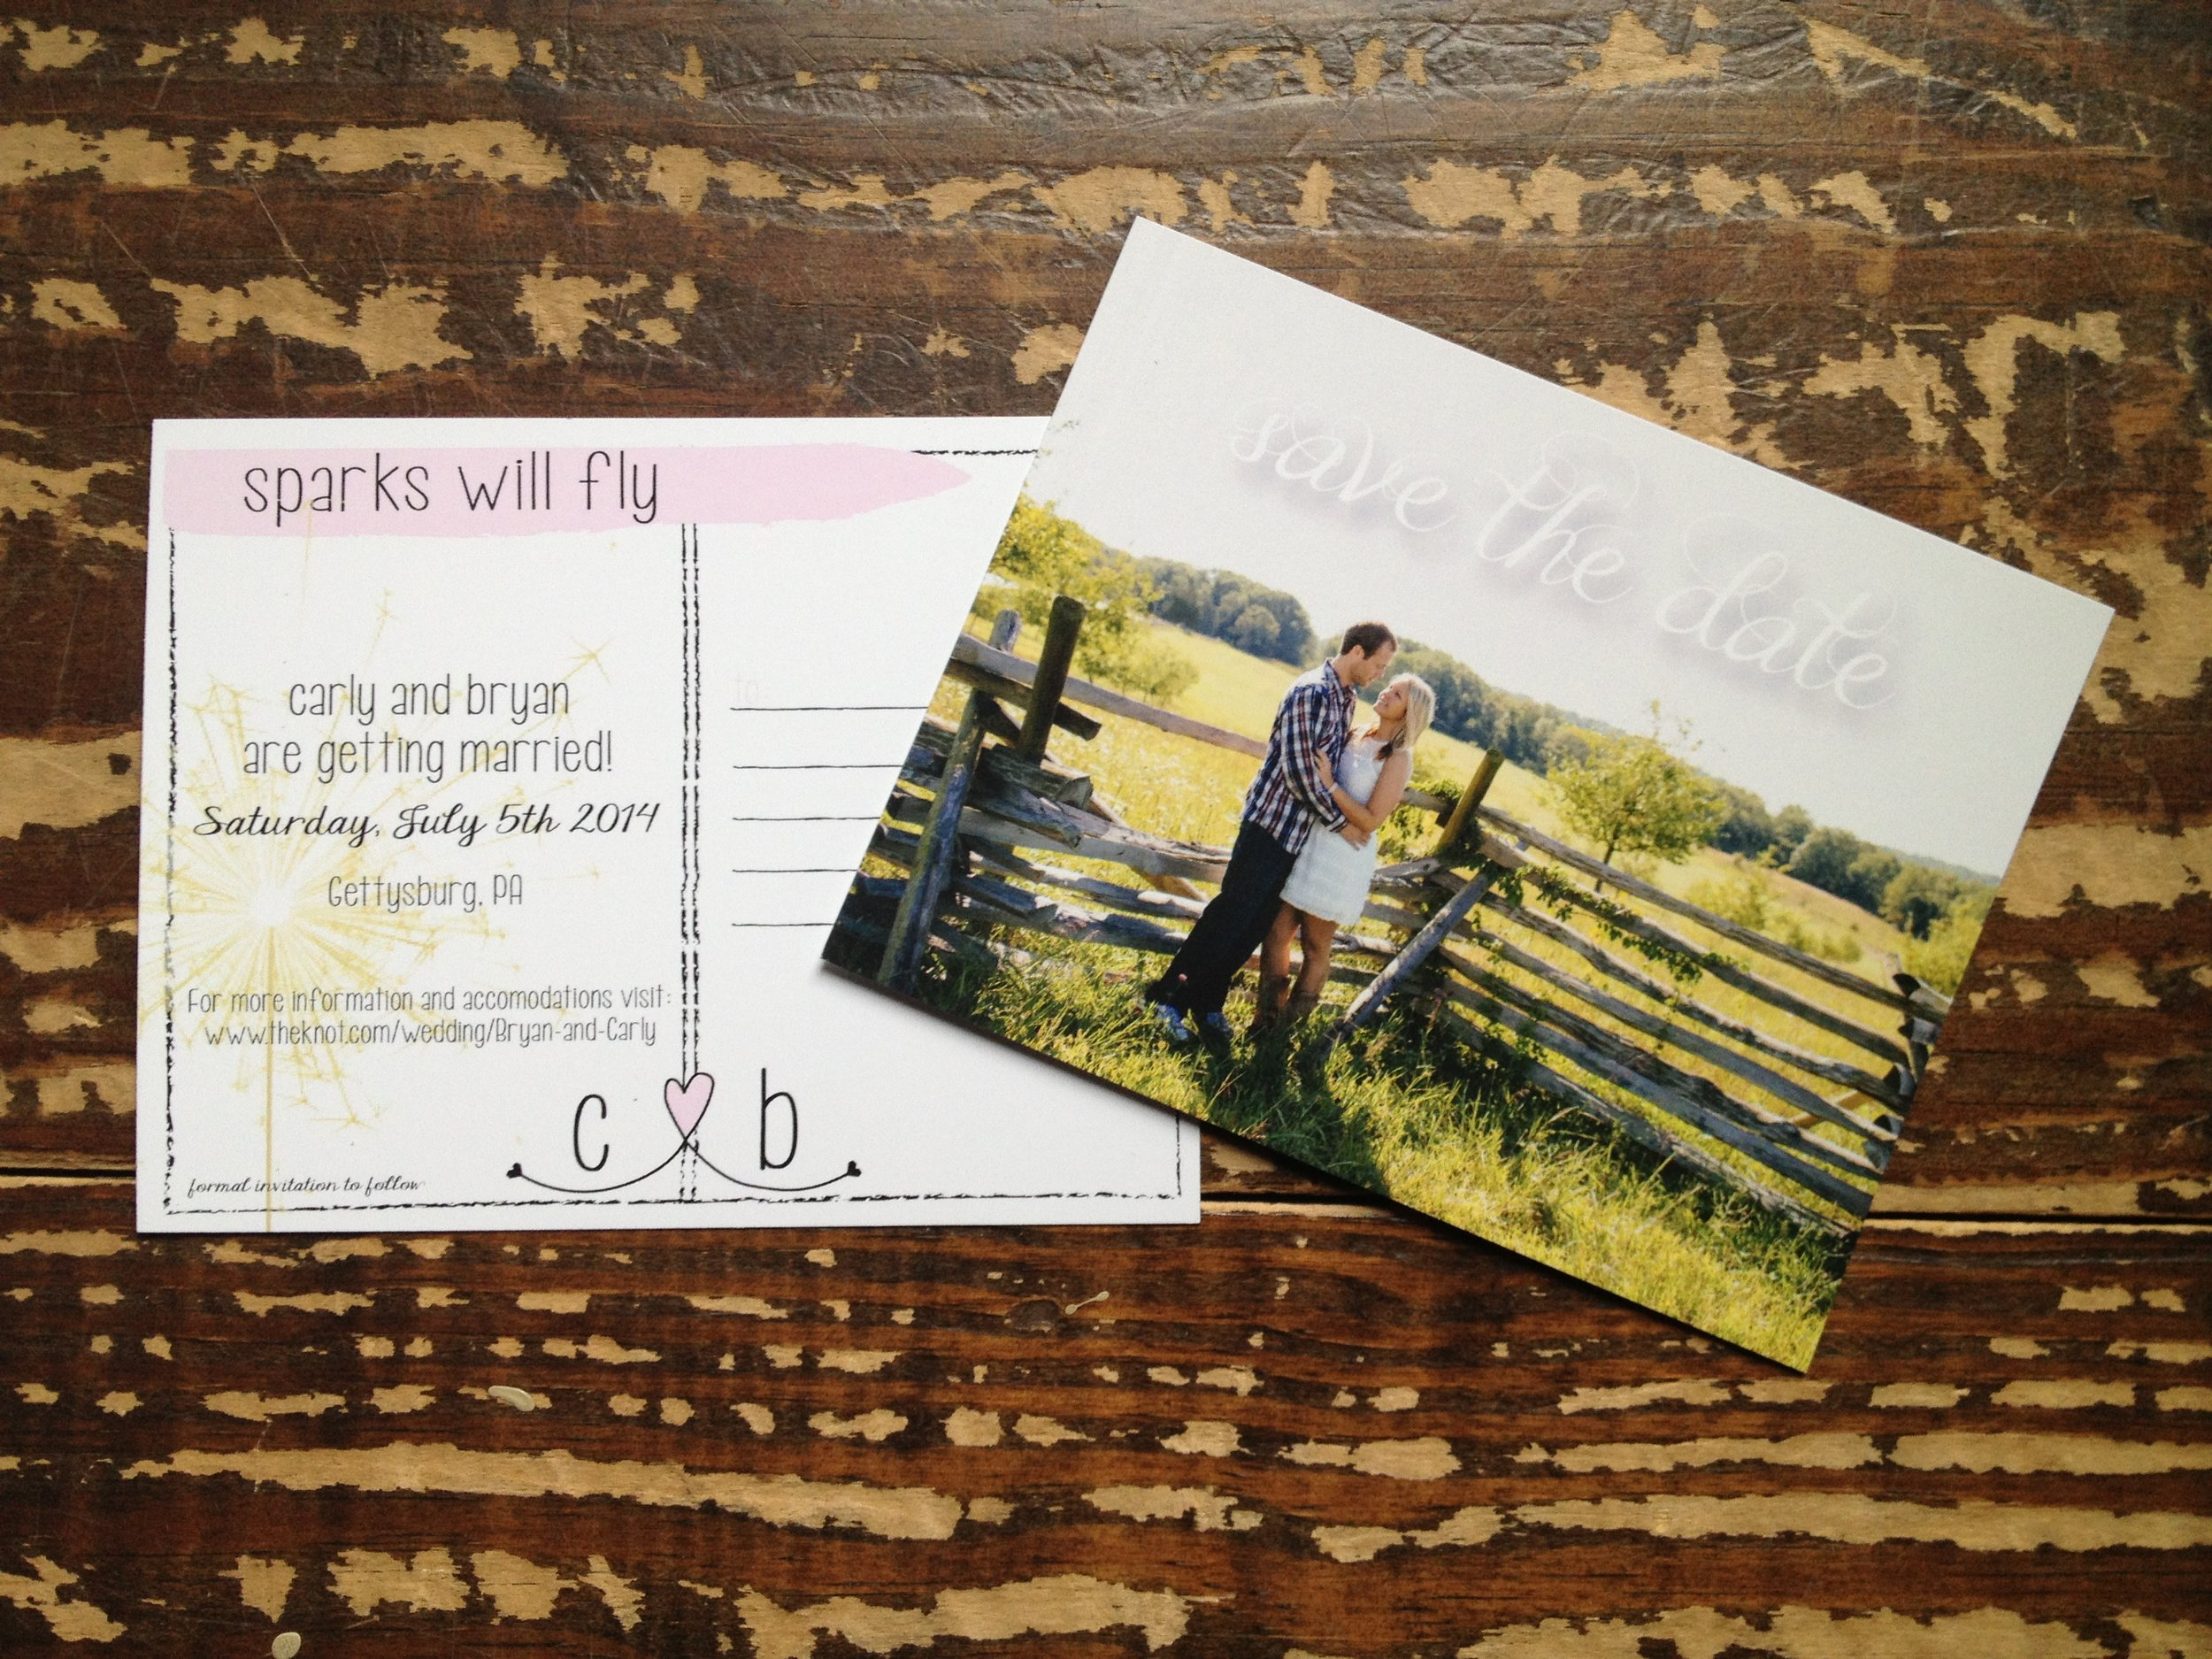 Central PA, York PA, JesSmith Designs, custom, wedding, invitations, bridal, announcements, save the date, baby, hanover, calligraphy, baltimore, wedding invitations, lancaster, gettysburg.jpg